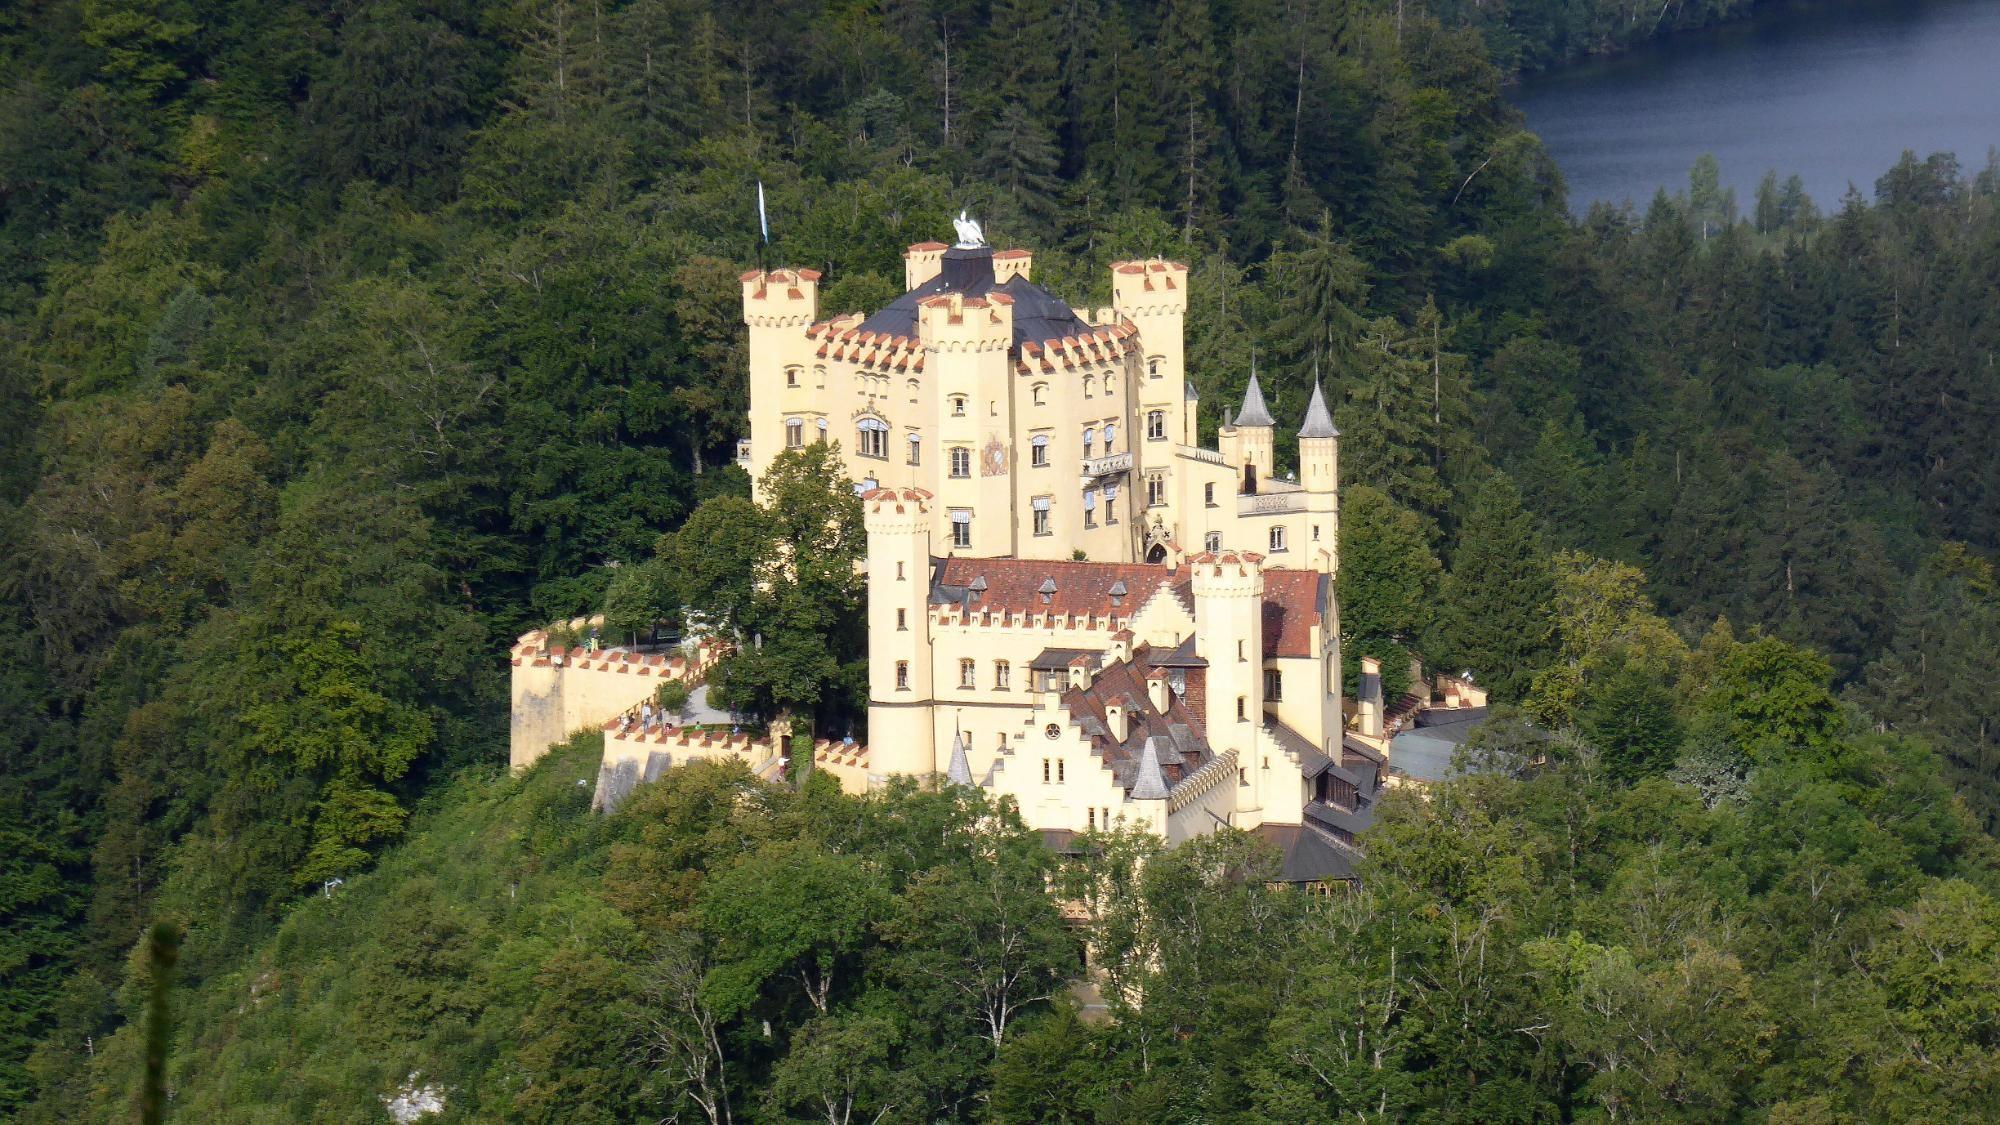 Schloss Hohenschwangau Germany Castles Beautiful Castles Neuschwanstein Castle